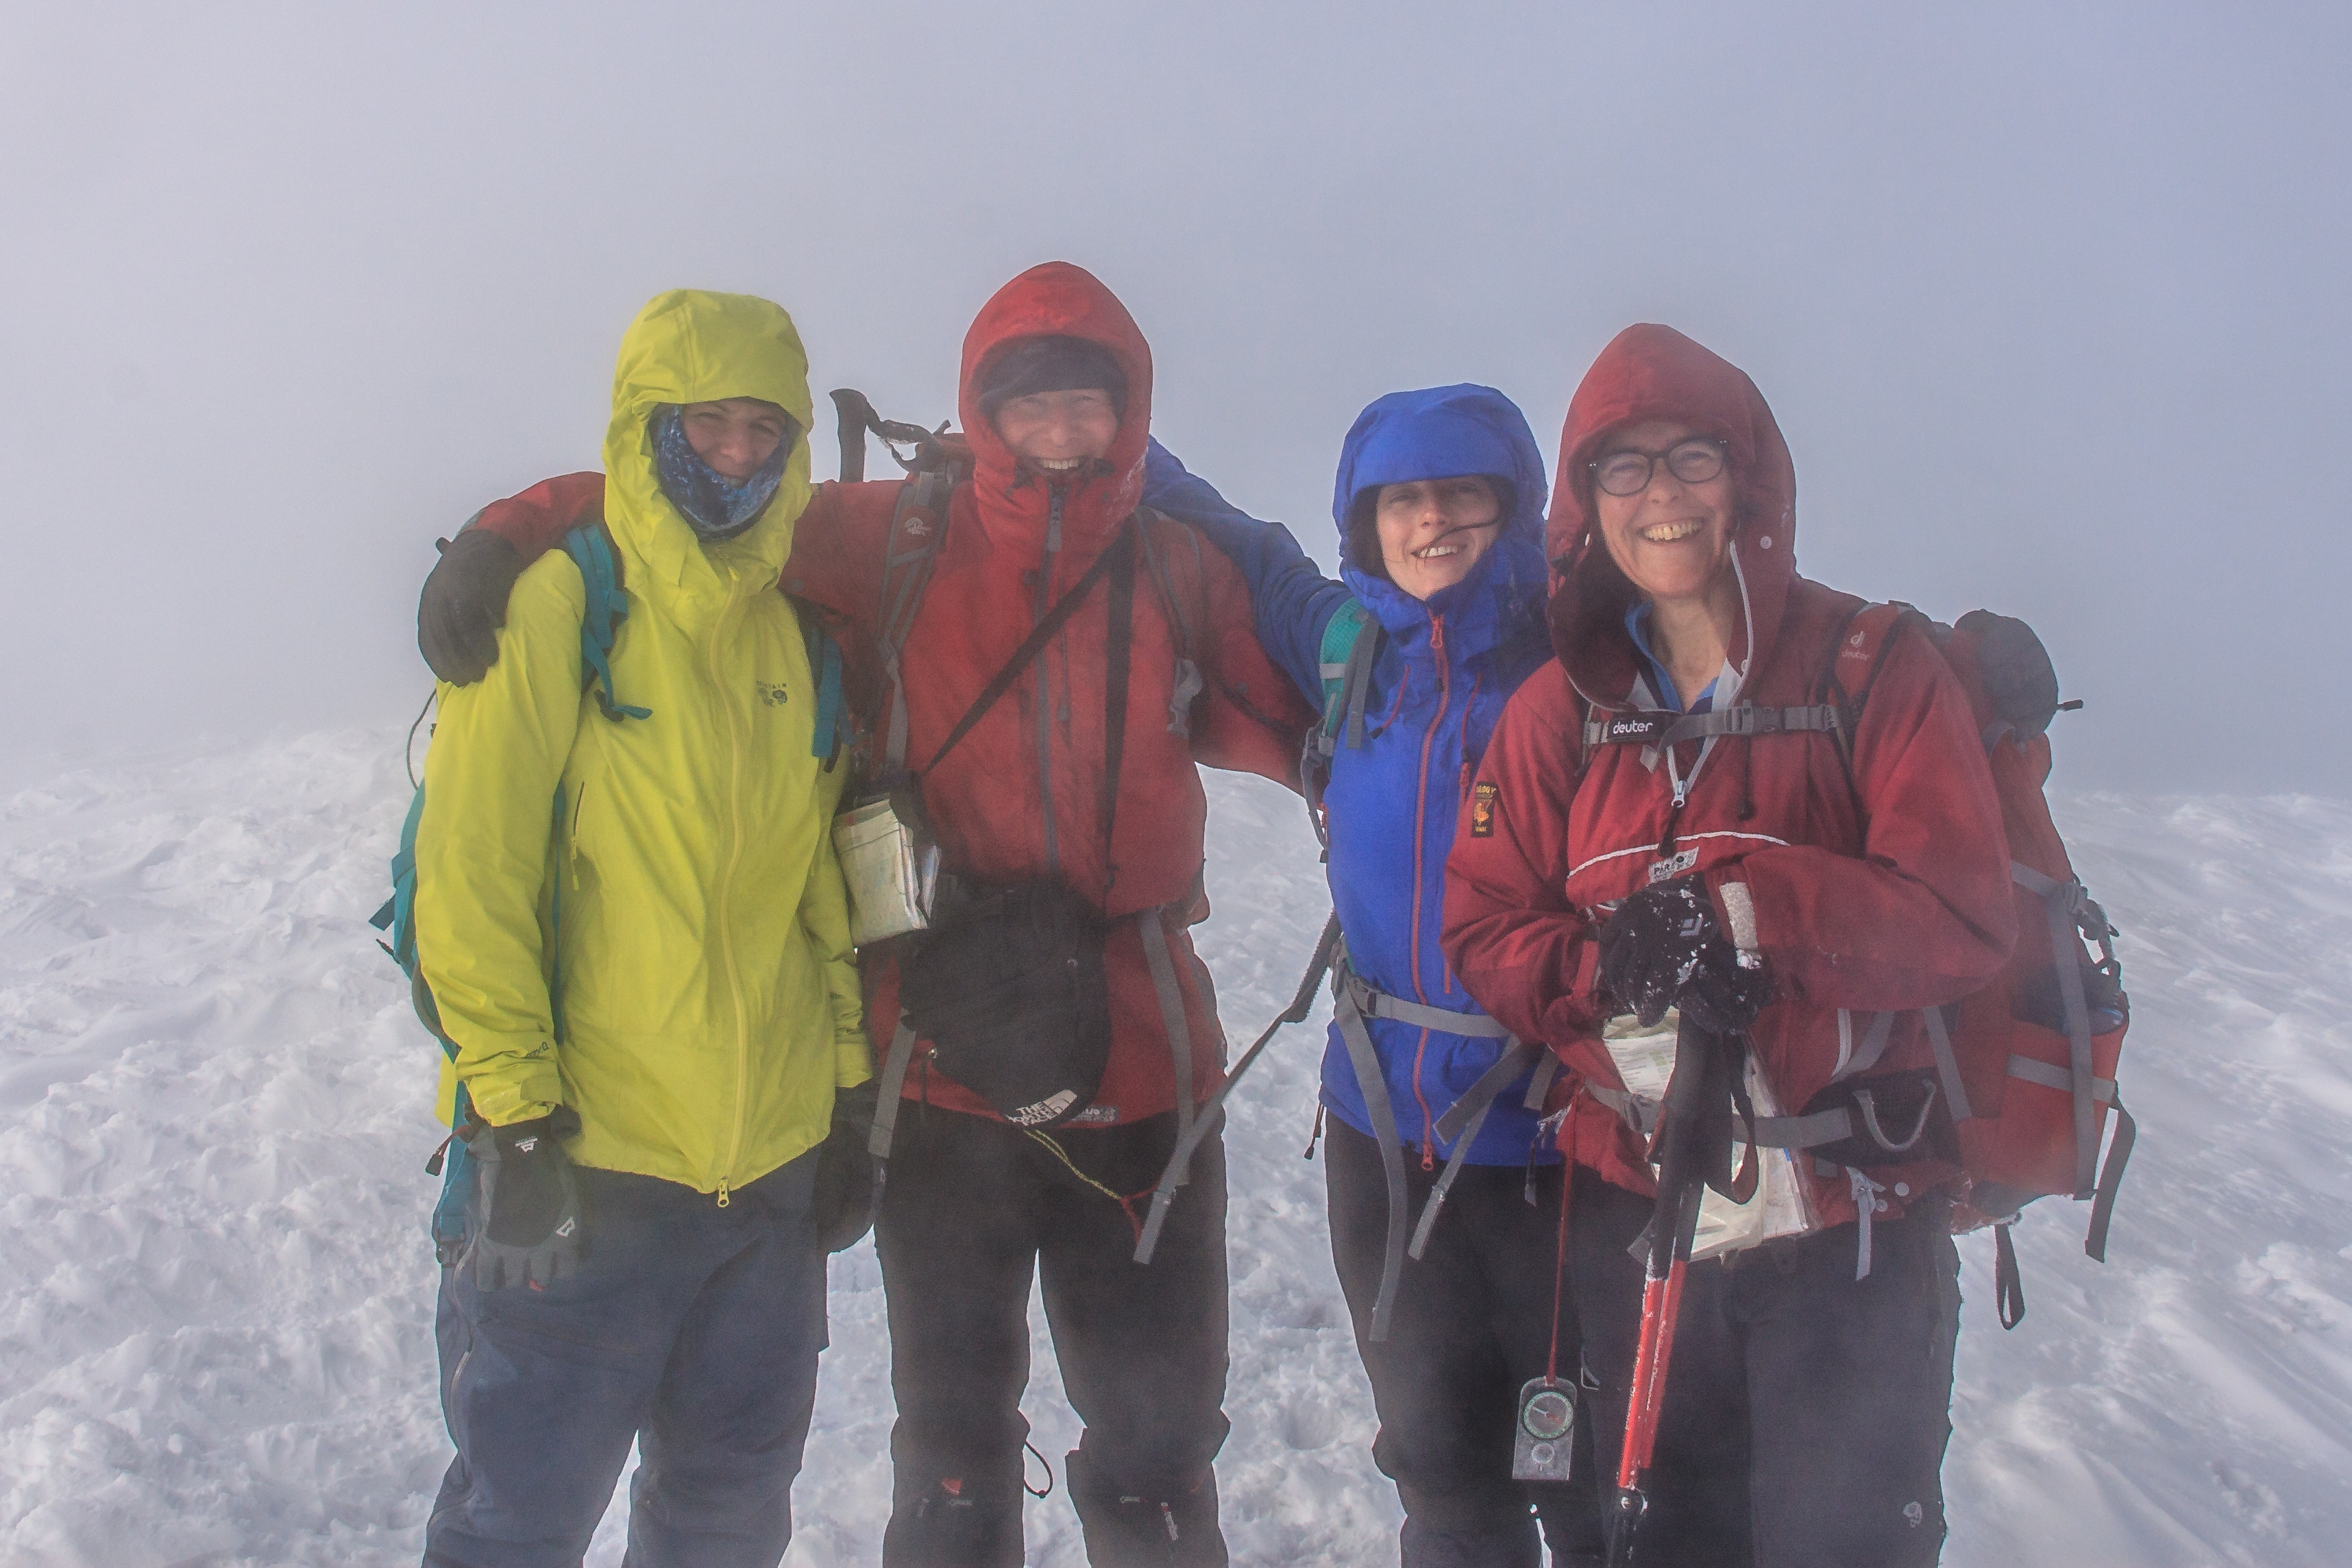 On the summit of Beinn na Lap